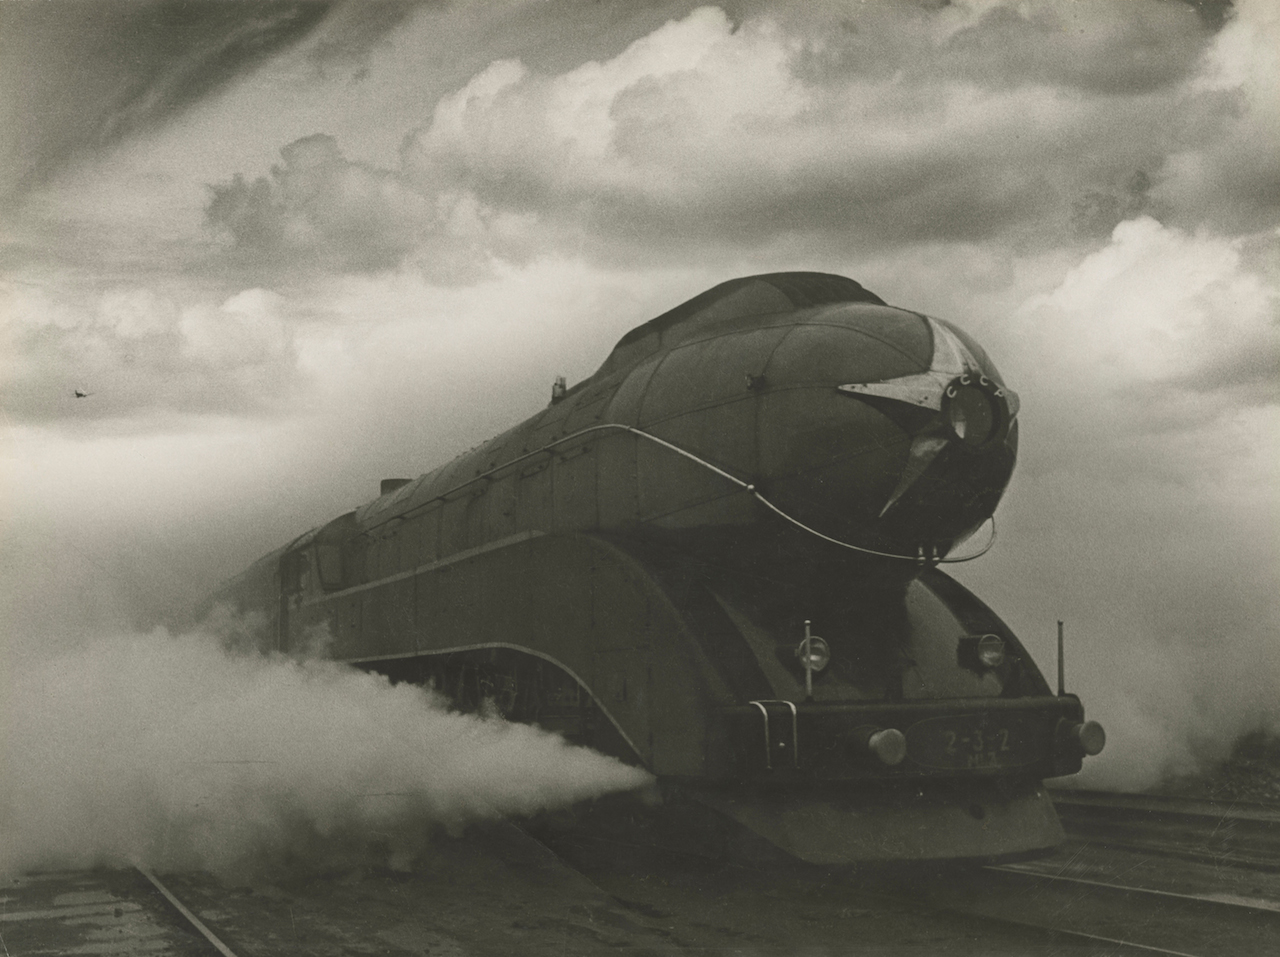 Arkady Shaikhet, Express, 1939, gelatin silver print. Nailya Alexander Gallery, New York. Artwork © Estate of Arkady Shaikhet / courtesy of Nailya Alexander Gallery.